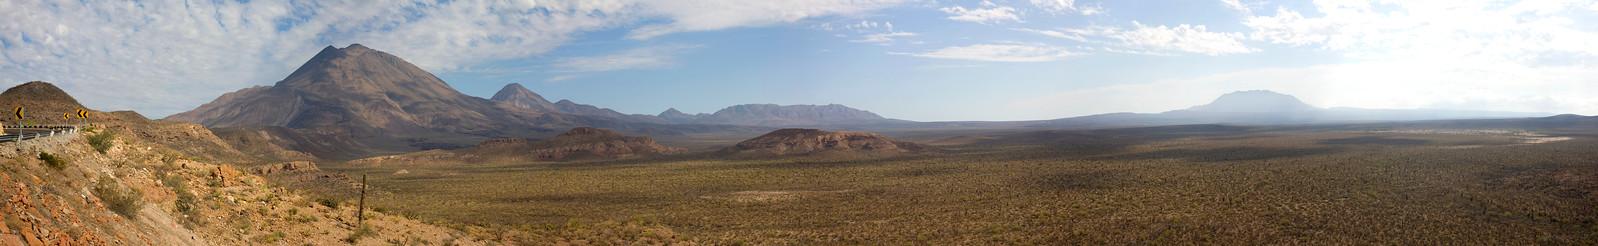 Baja Panoramics